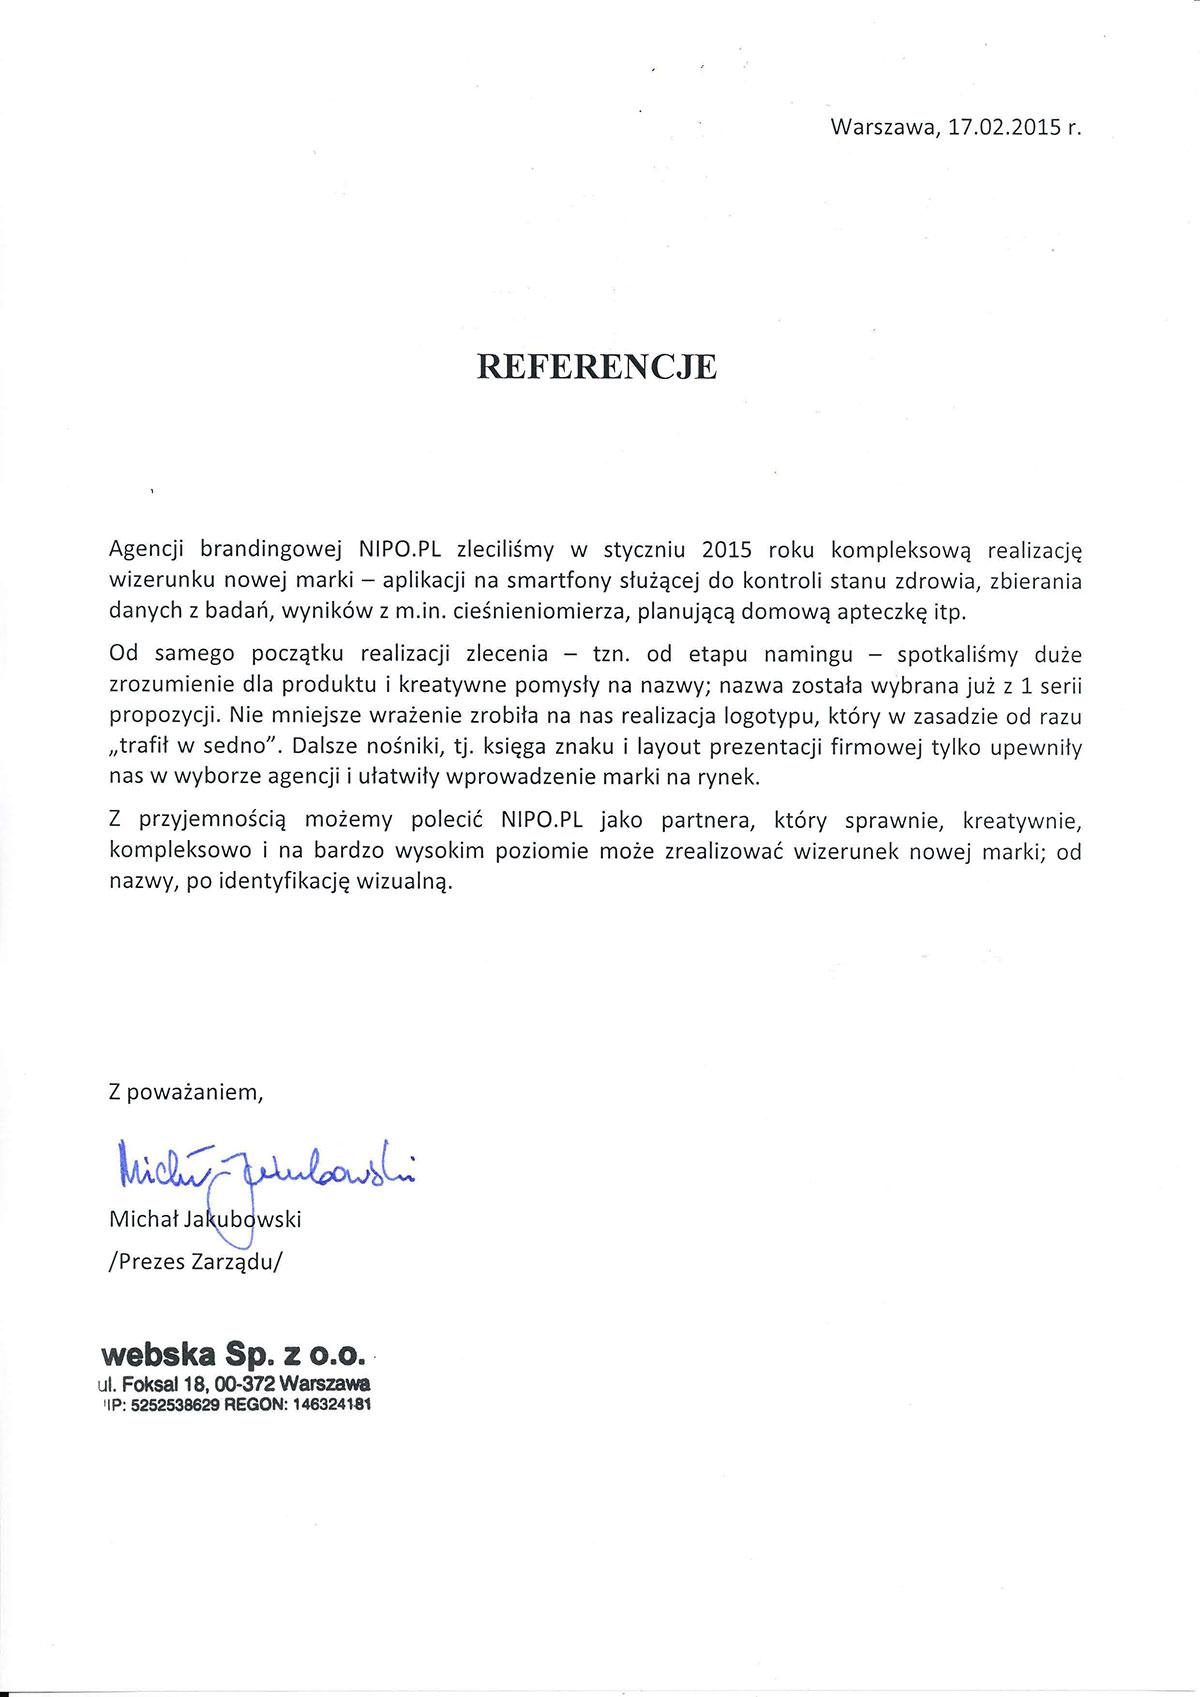 Referencje_webska